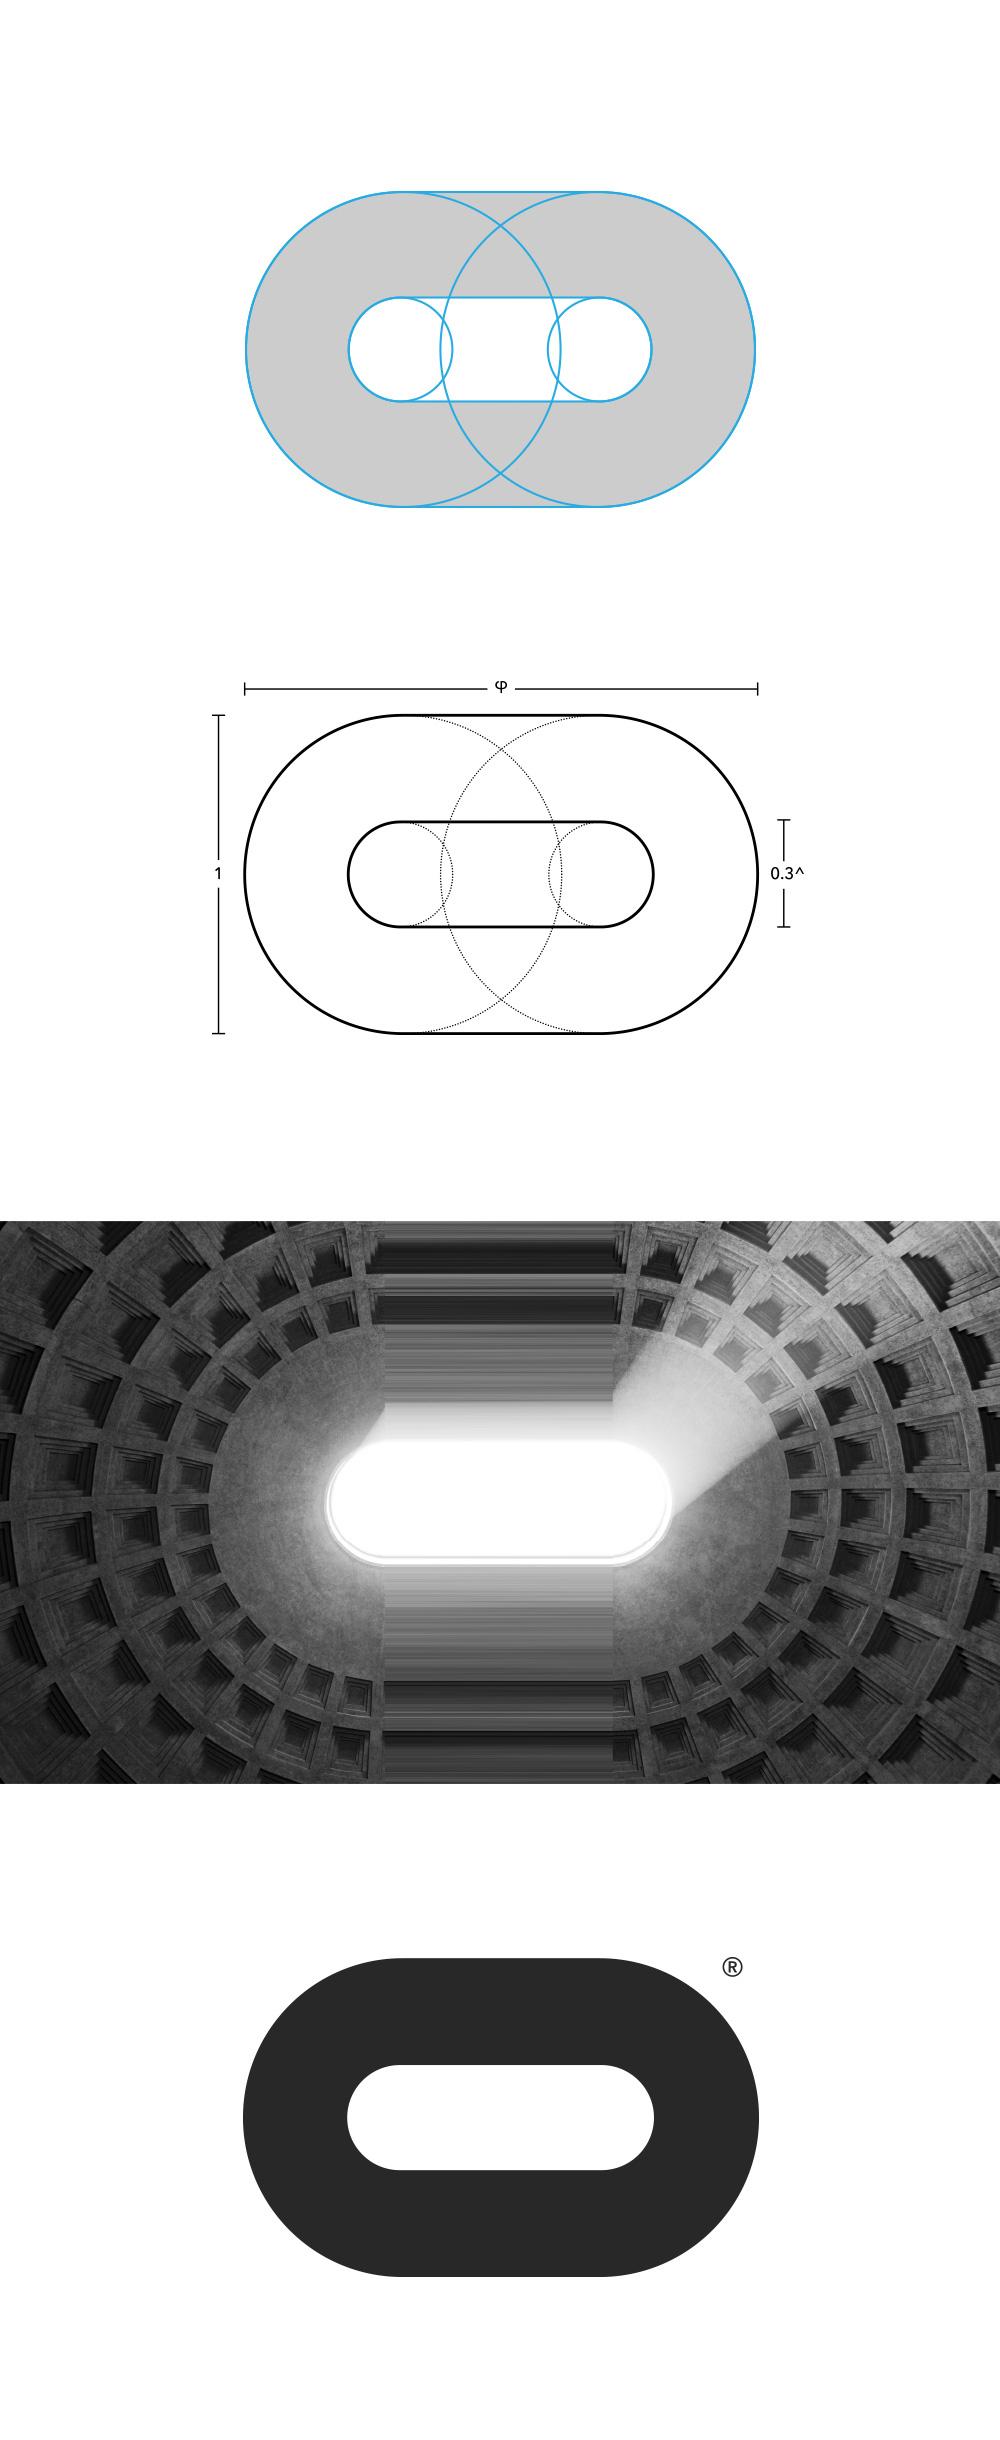 Brand New: New Logo for Oculus by Cory Schmitz, Mackey.